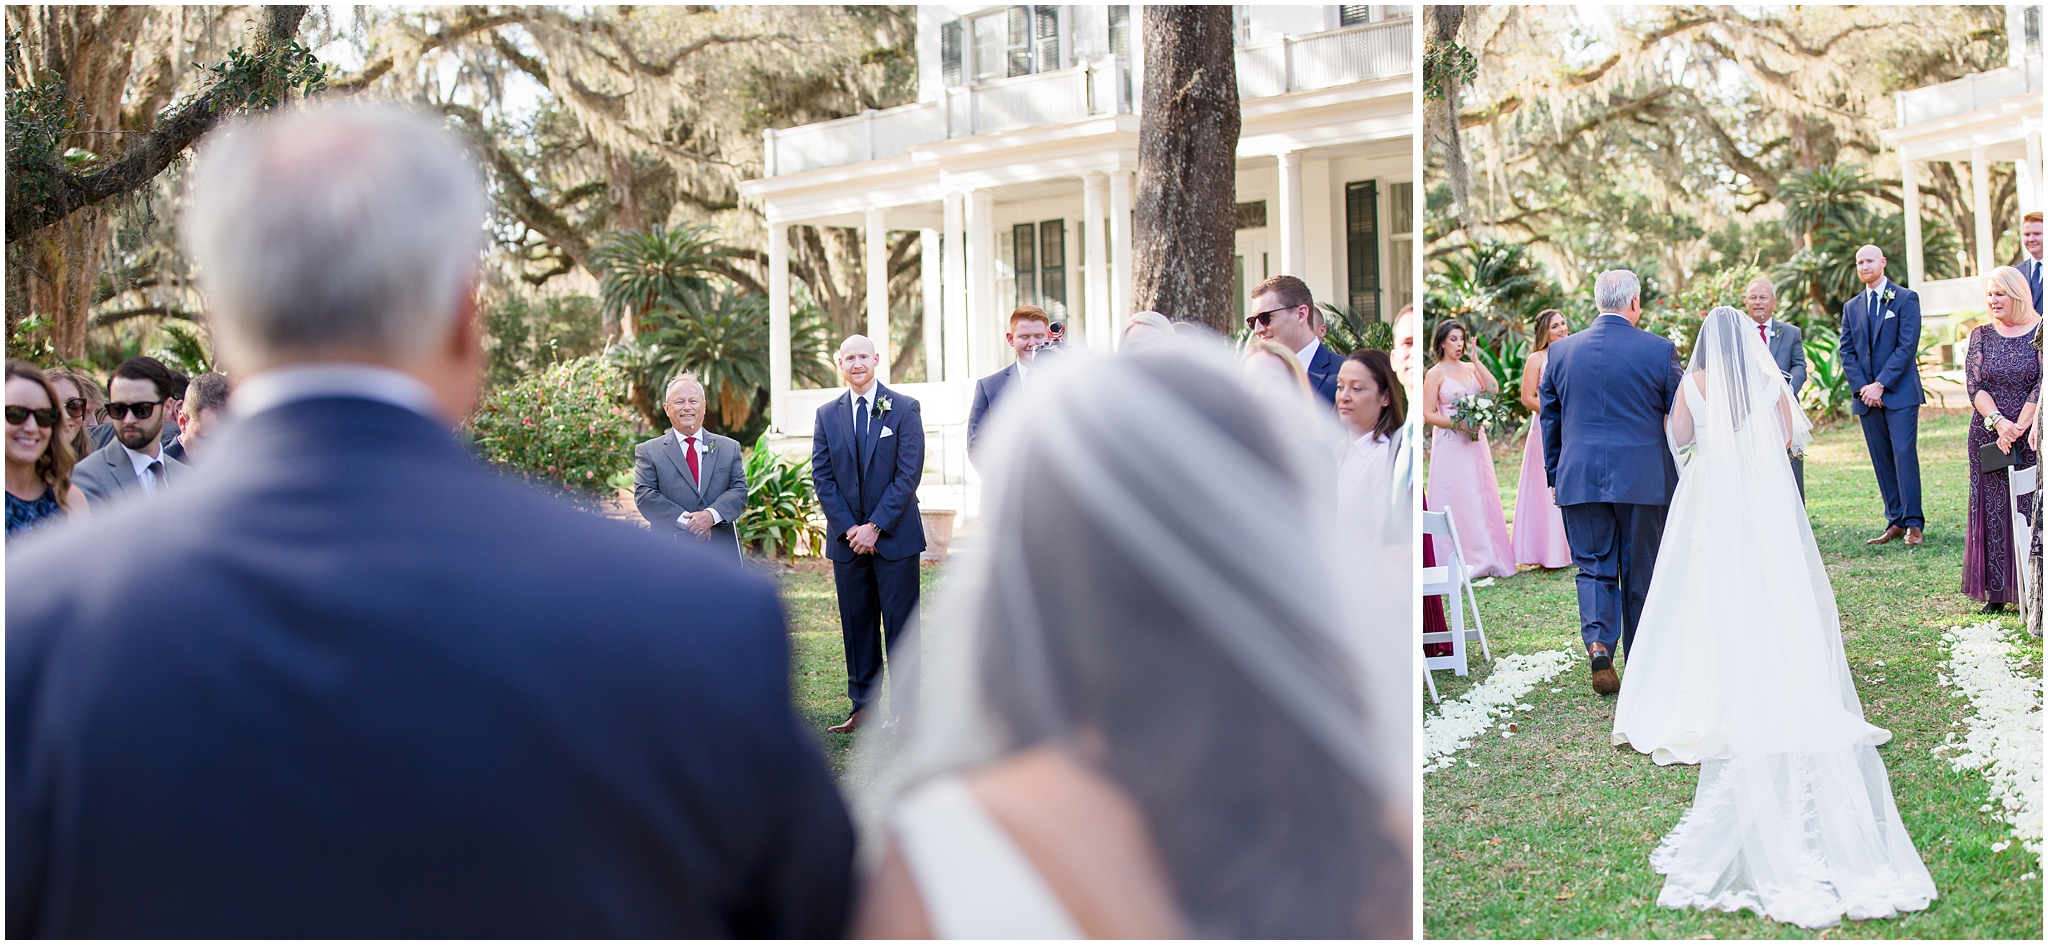 Tallahassee_Wedding_Ceremony_Charlotte_Fristoe.jpg